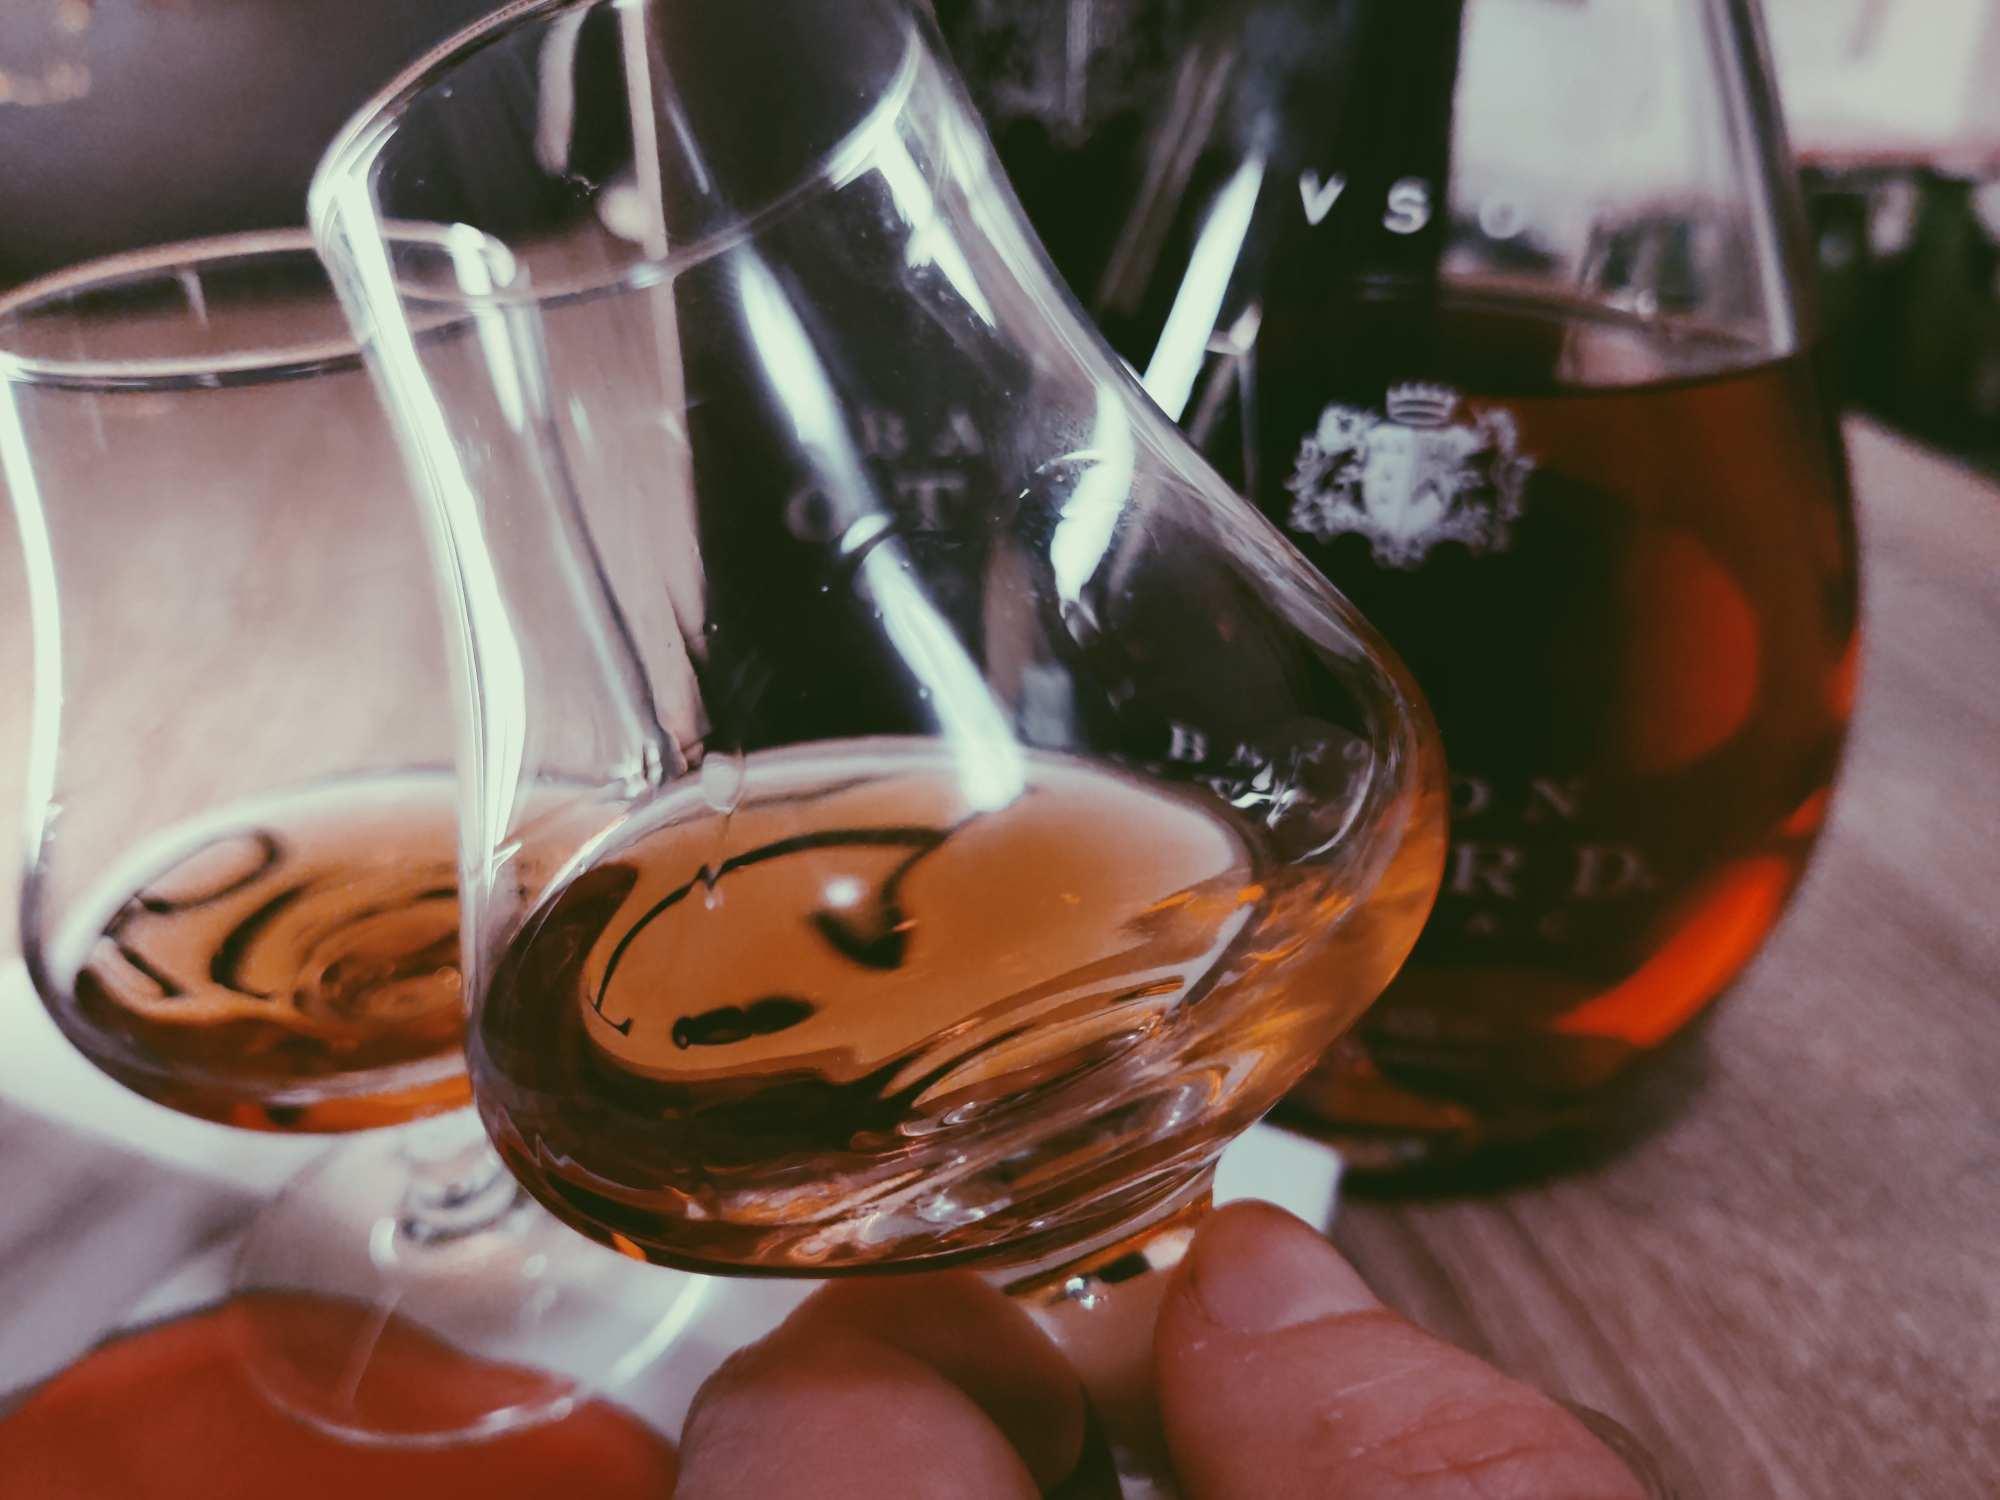 Baron Otard VSOP Cognac Review